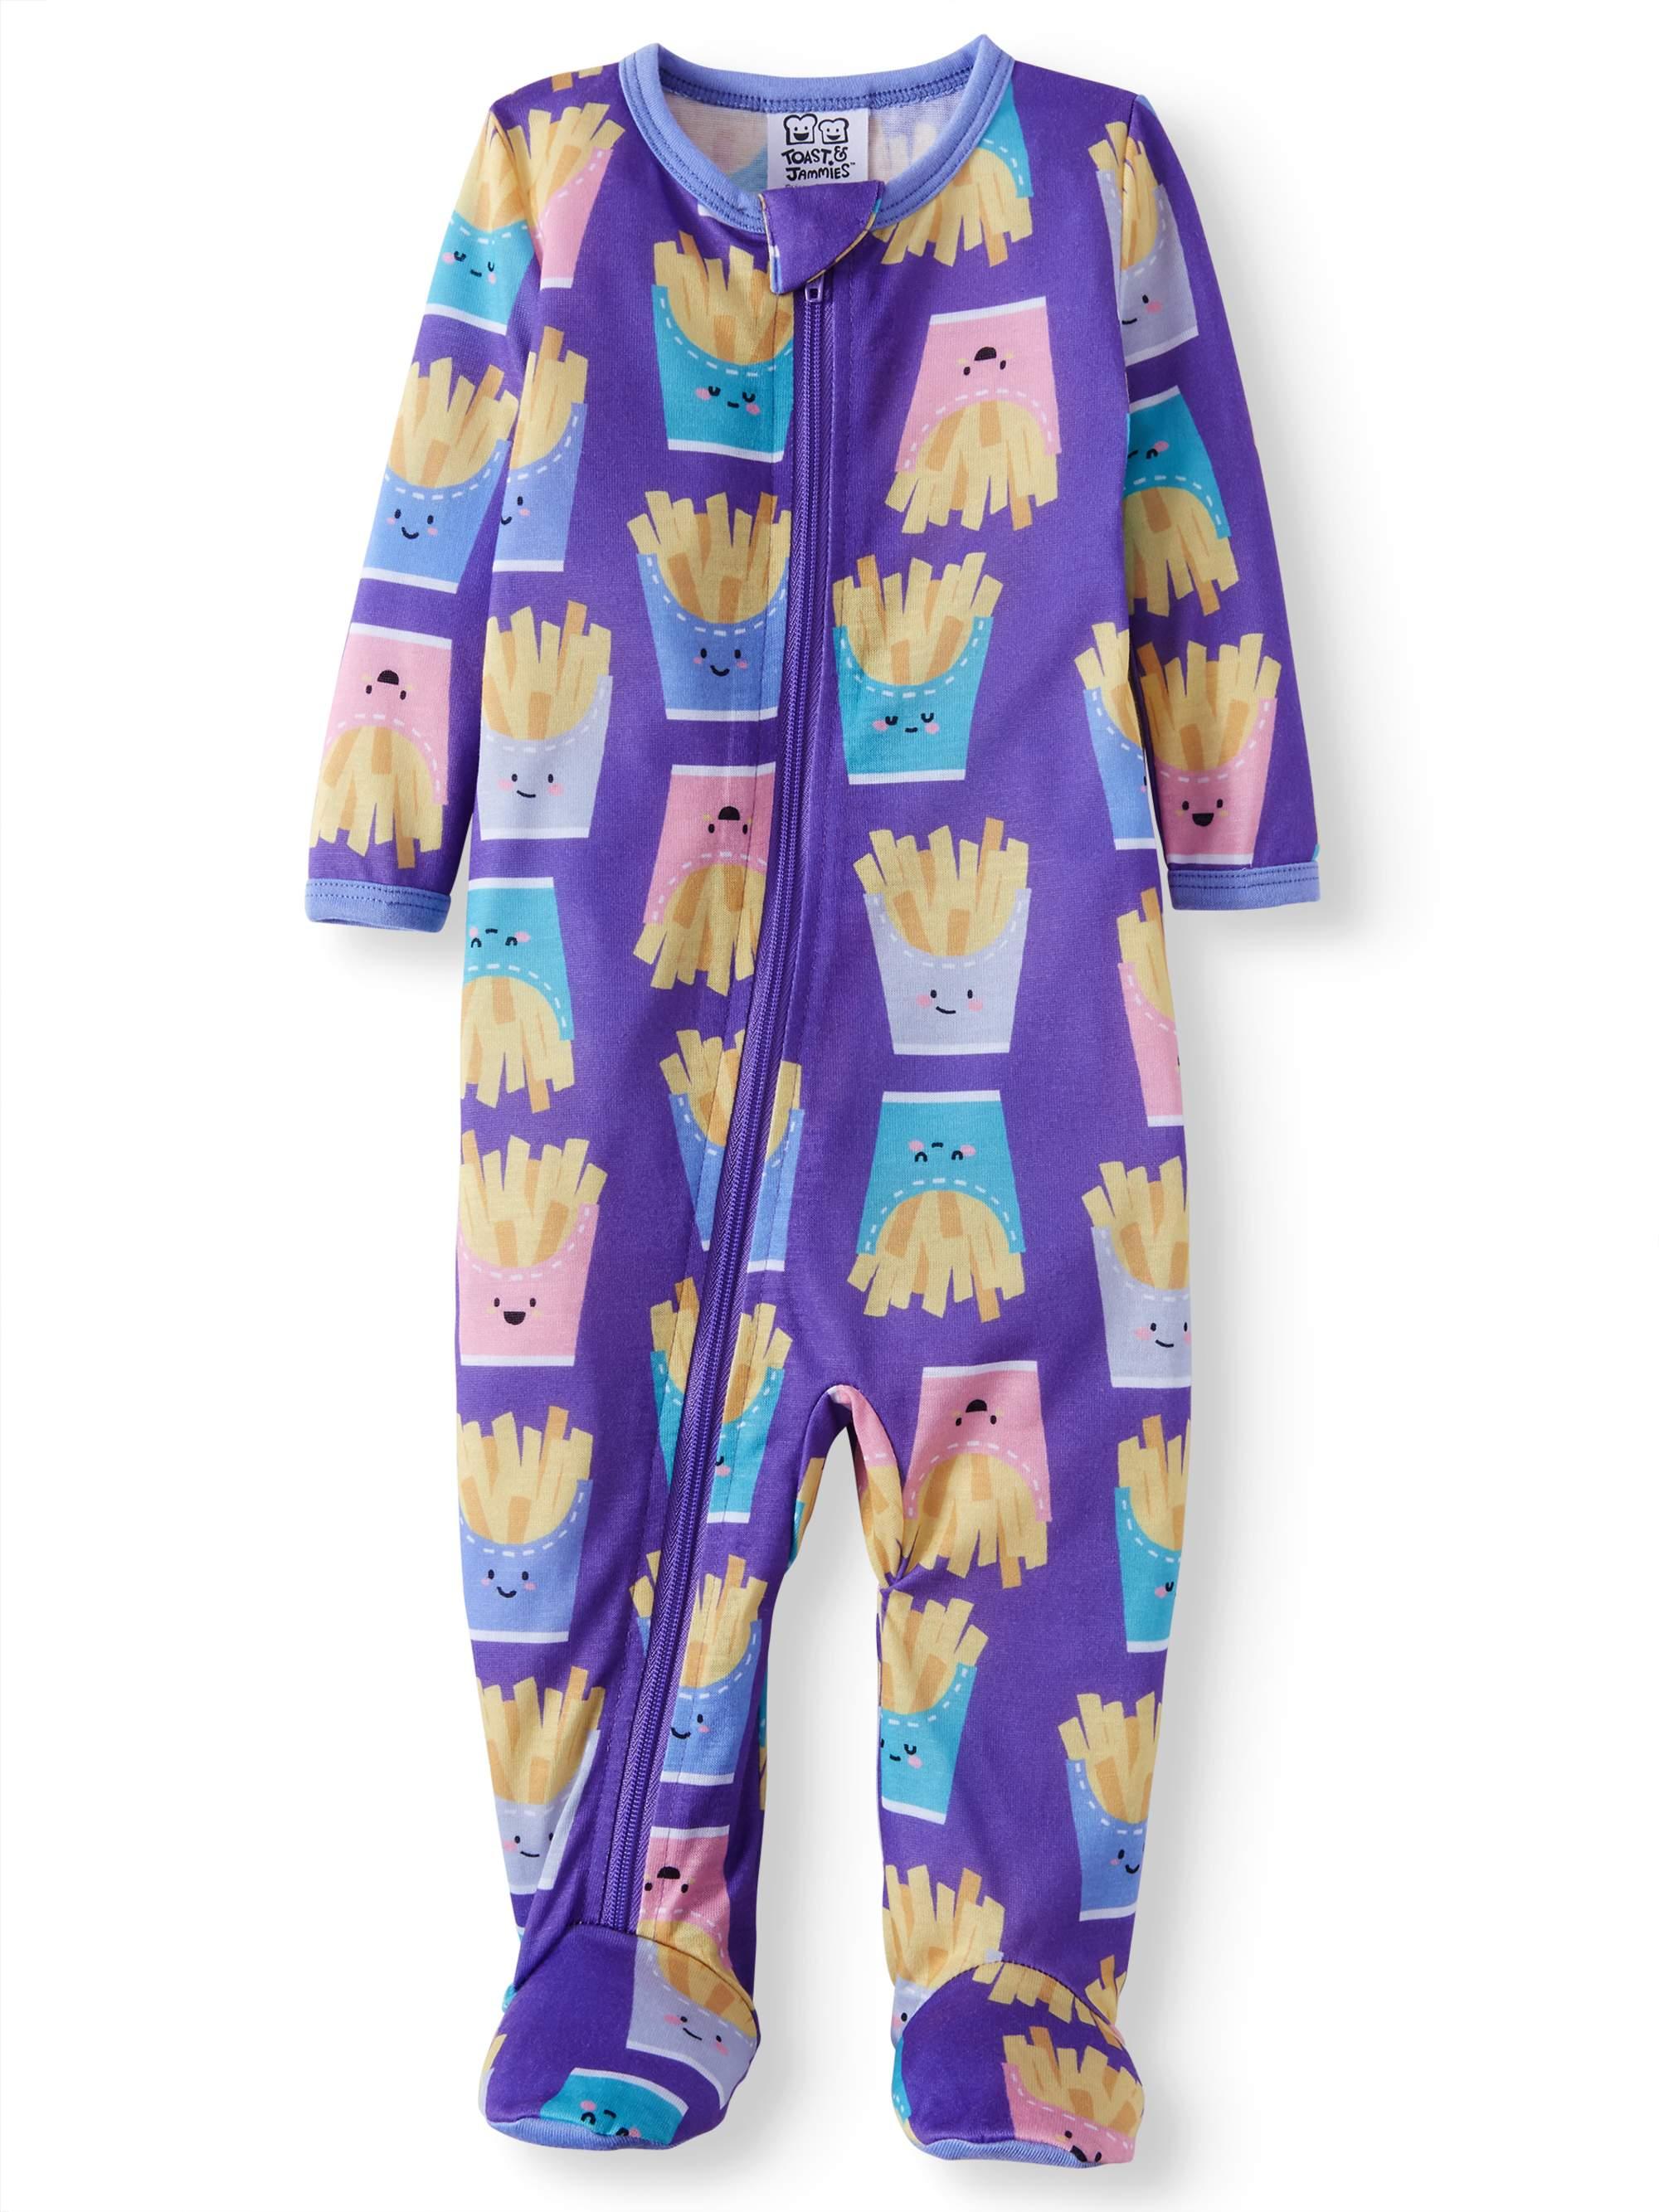 Snug Fit Footed Sleeper Pajamas (Baby Girls)